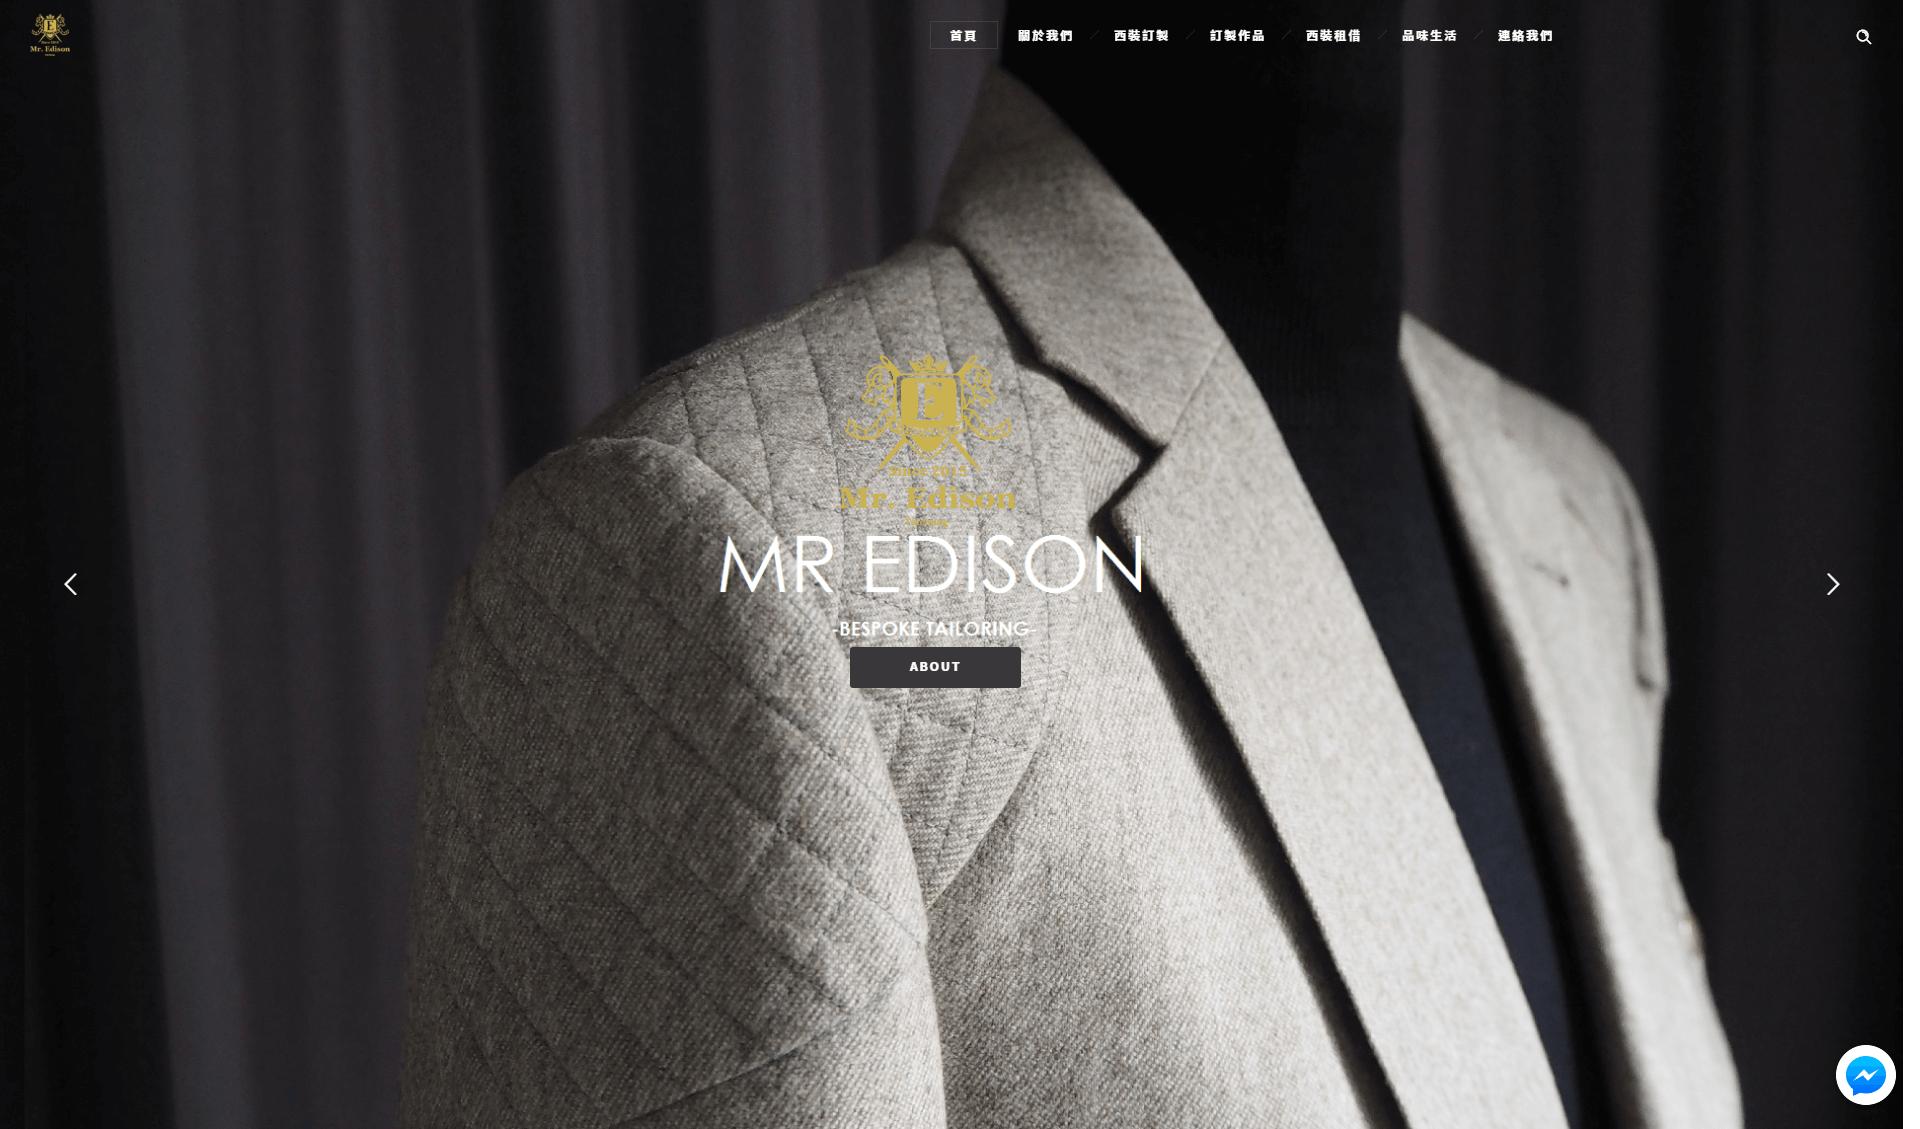 Mr.Edison Suit 西裝訂製 - SEO 優化 | 網站設計 | 網站架設